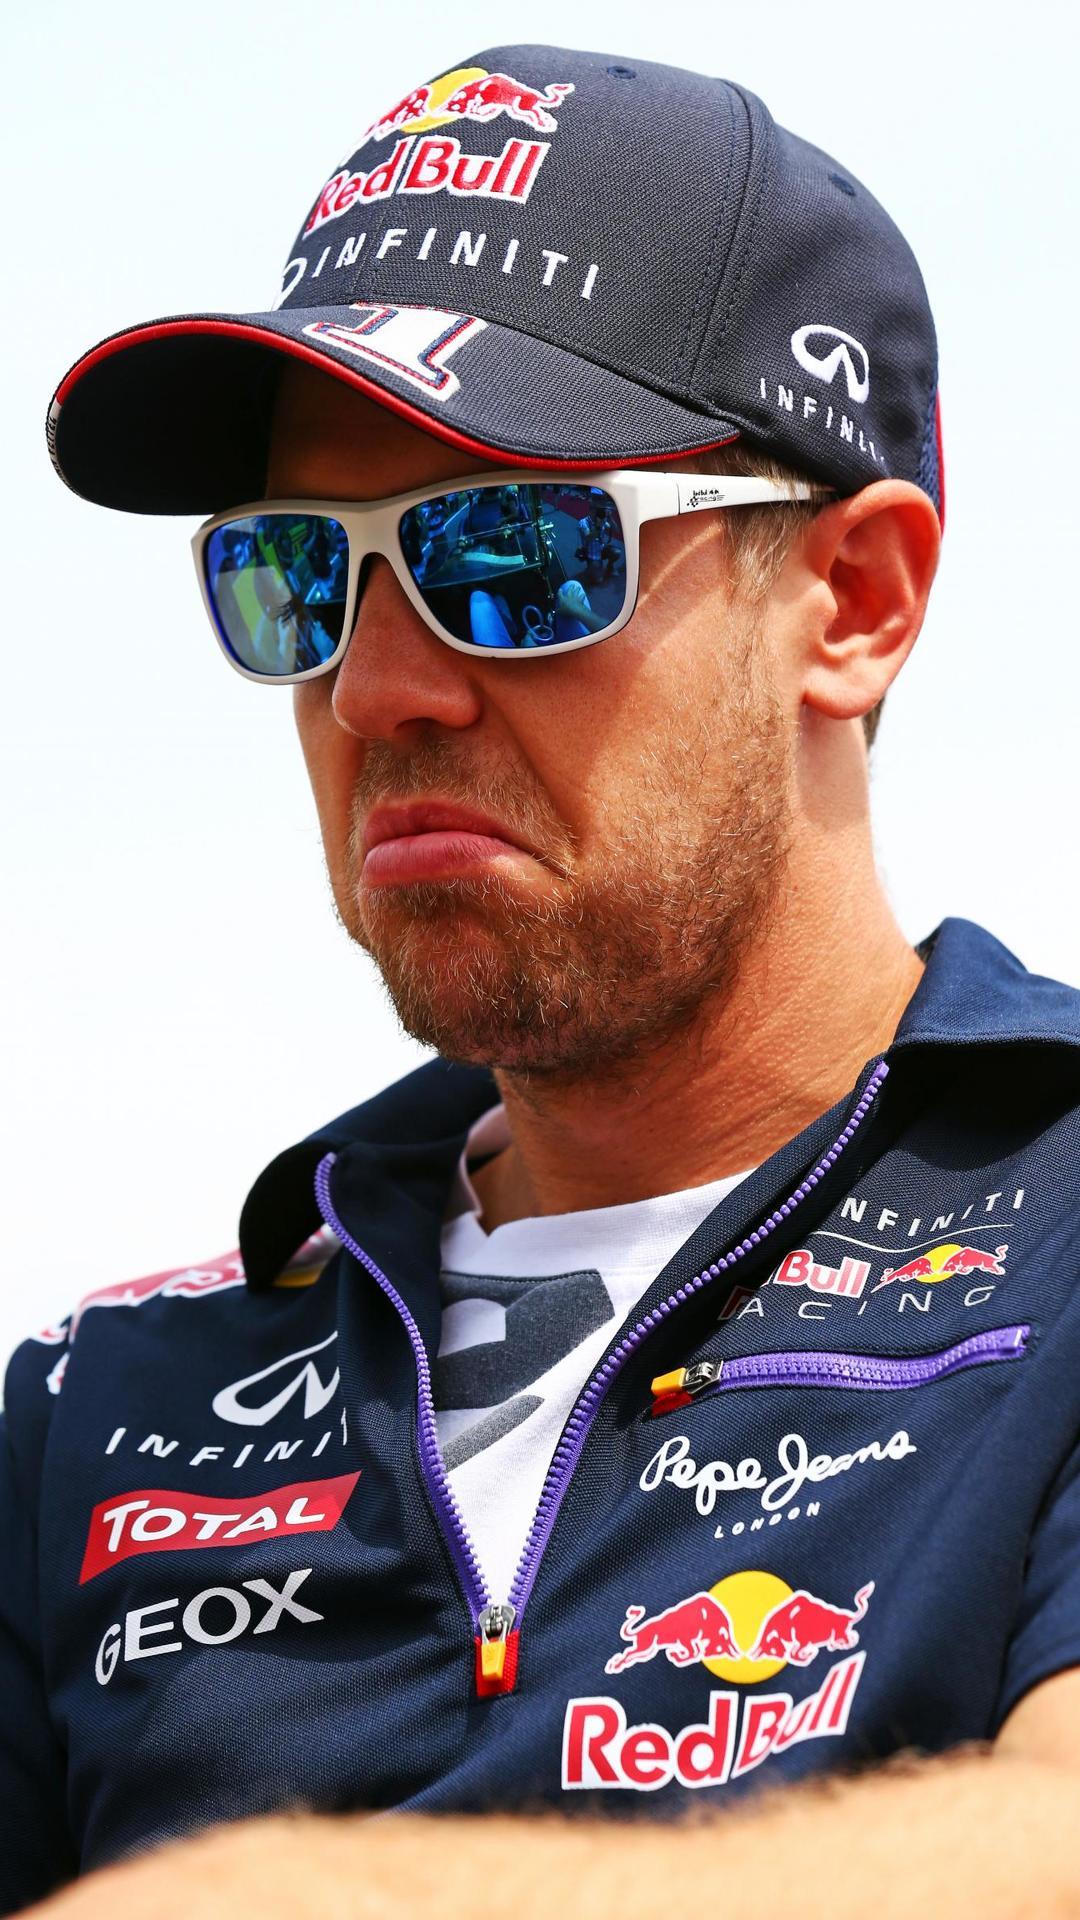 Vettel says critics 'disrespectful'